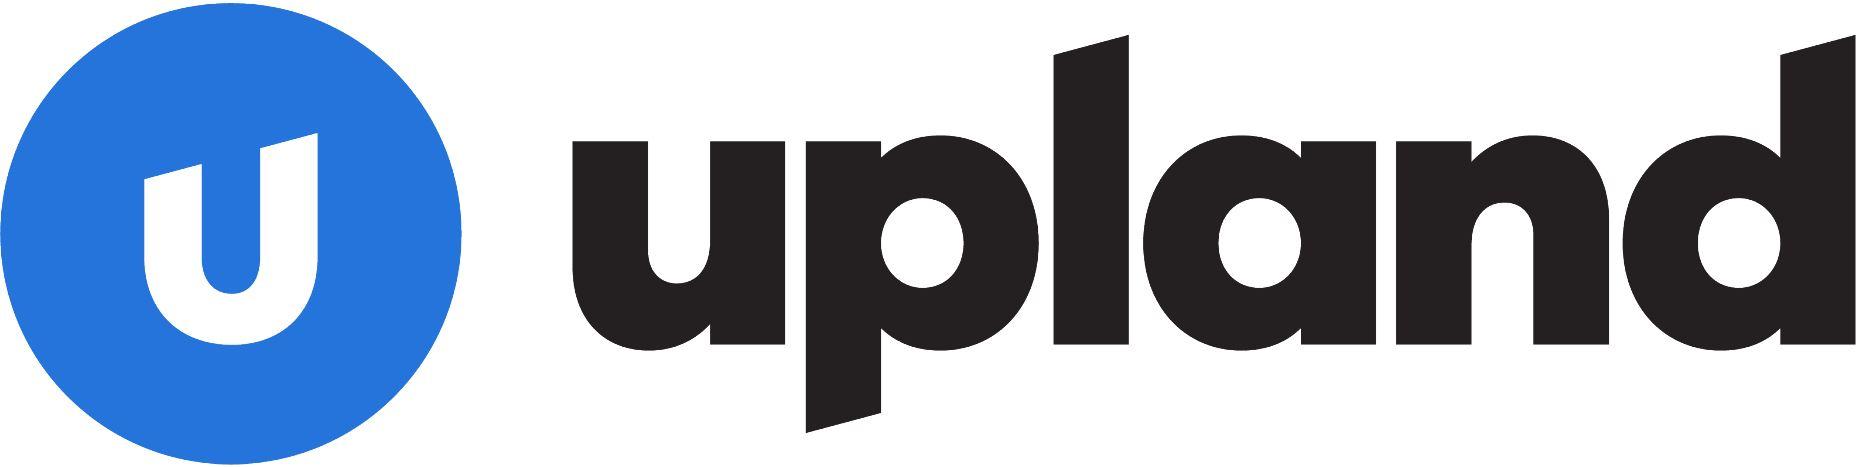 upld-20210331_g1.jpg